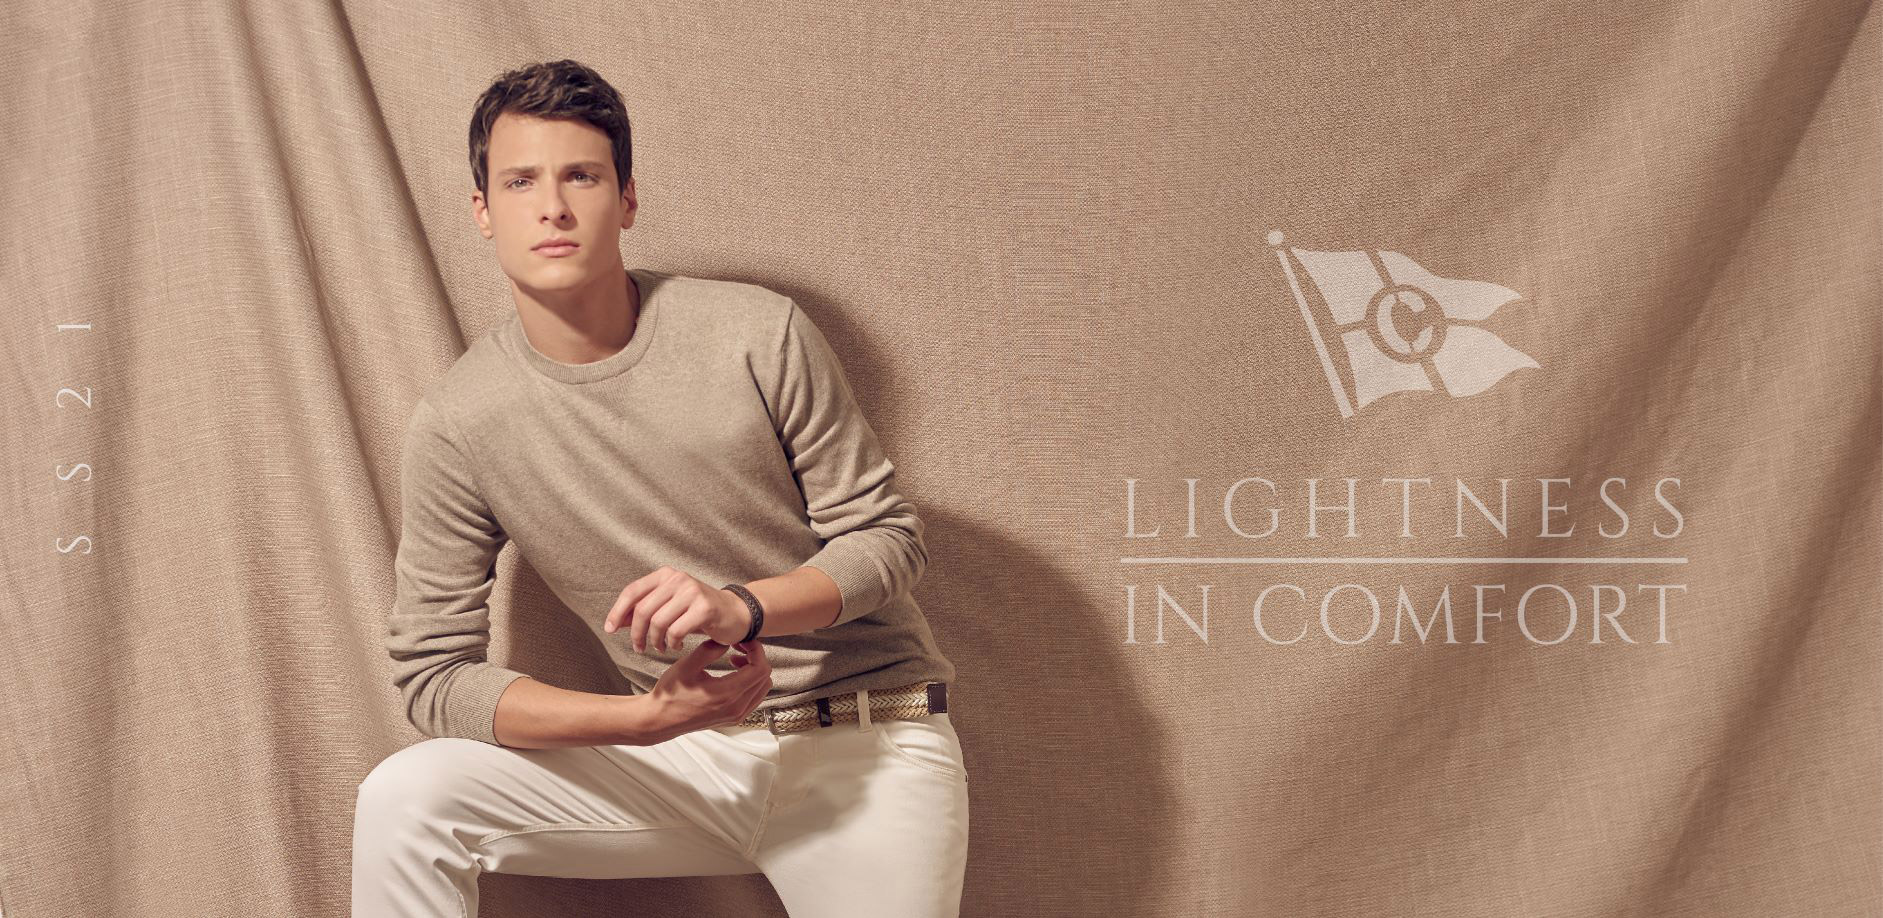 Lightness is confort